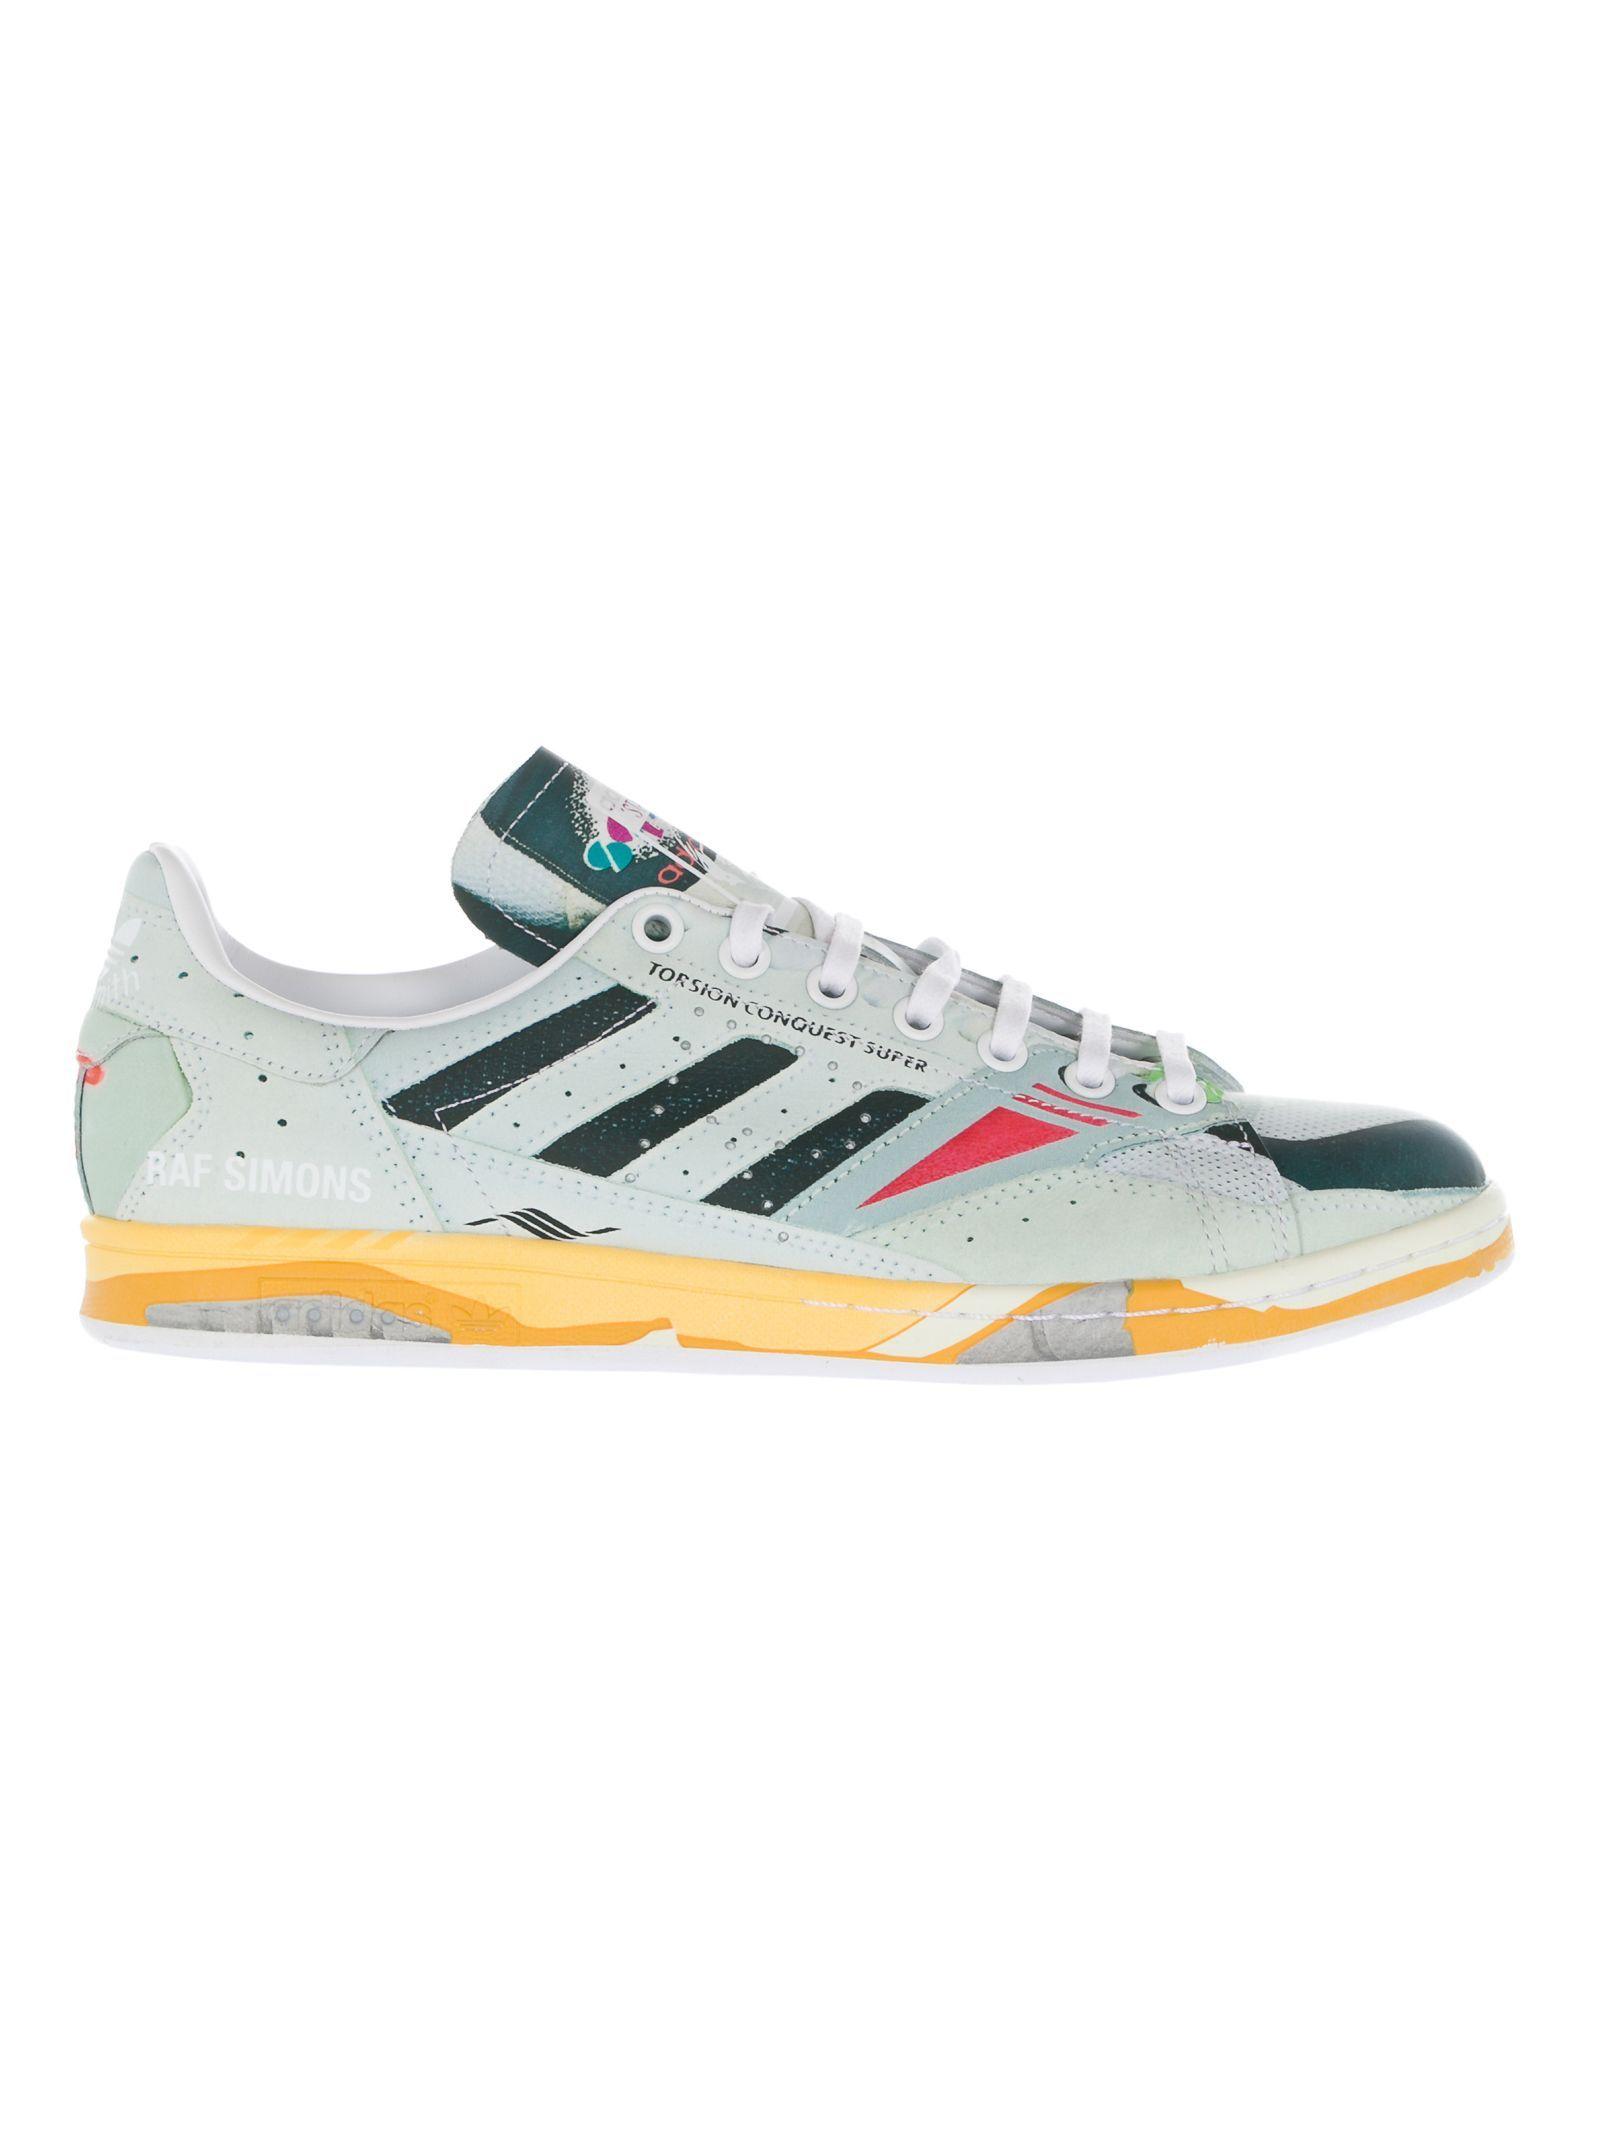 online store e9b6b f32b8 ADIDAS BY RAF SIMONS TORSION STAN SMITH SNEAKERS.  adidasbyrafsimons  shoes